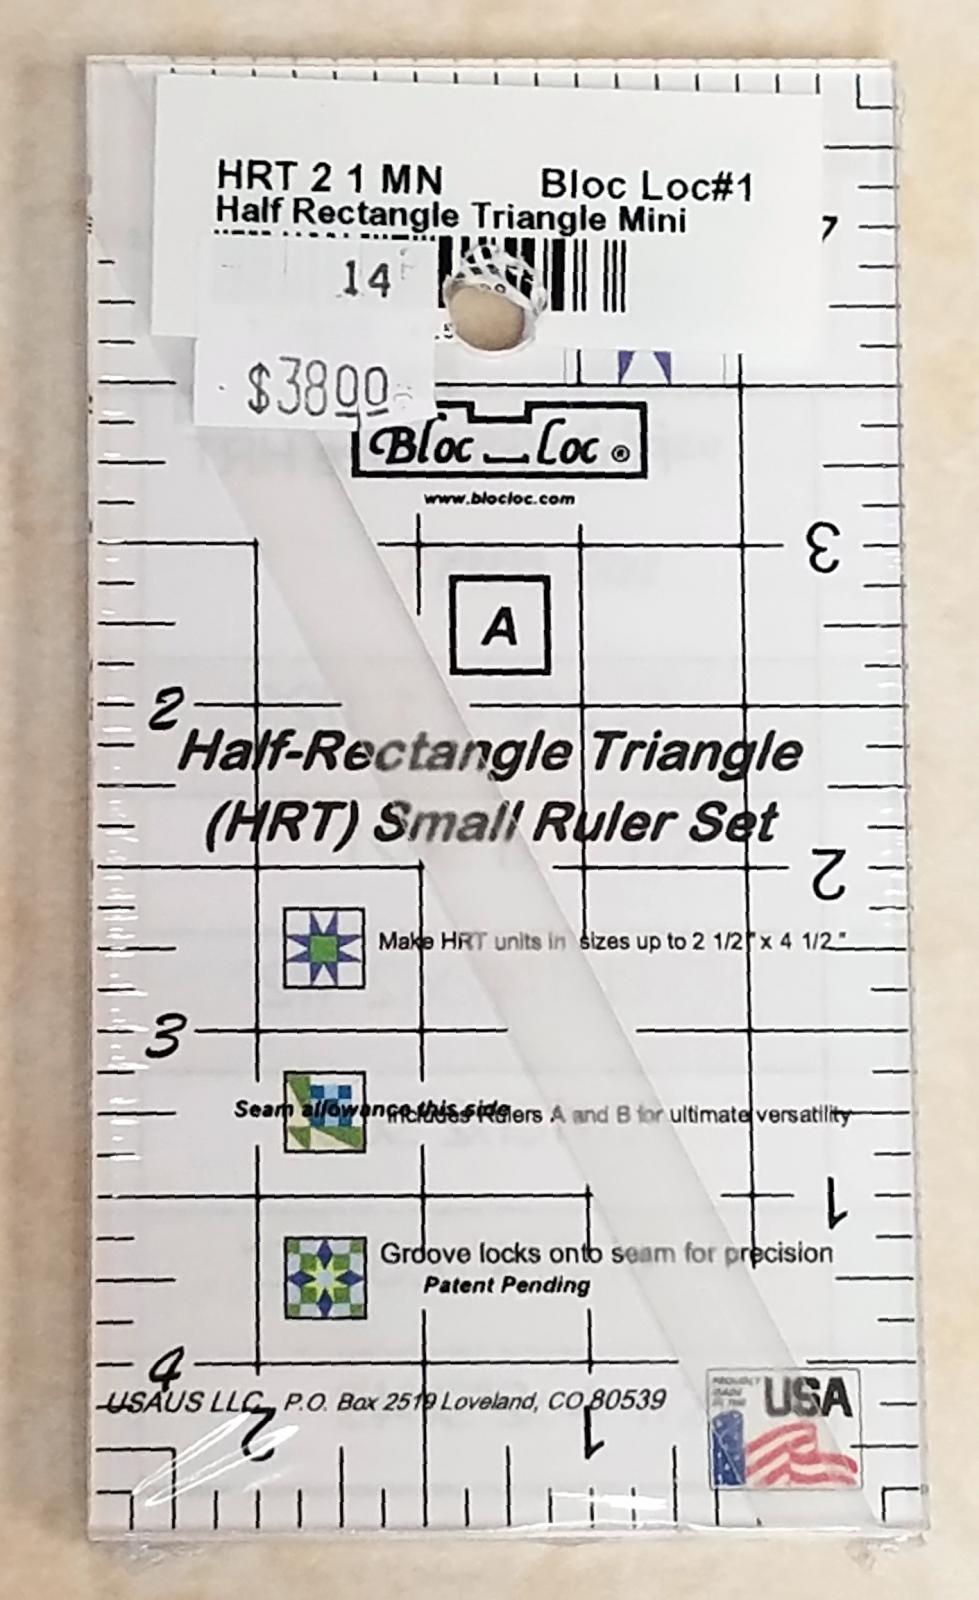 Bloc Loc Half Rectangle Triangle 2:1 Mini Set